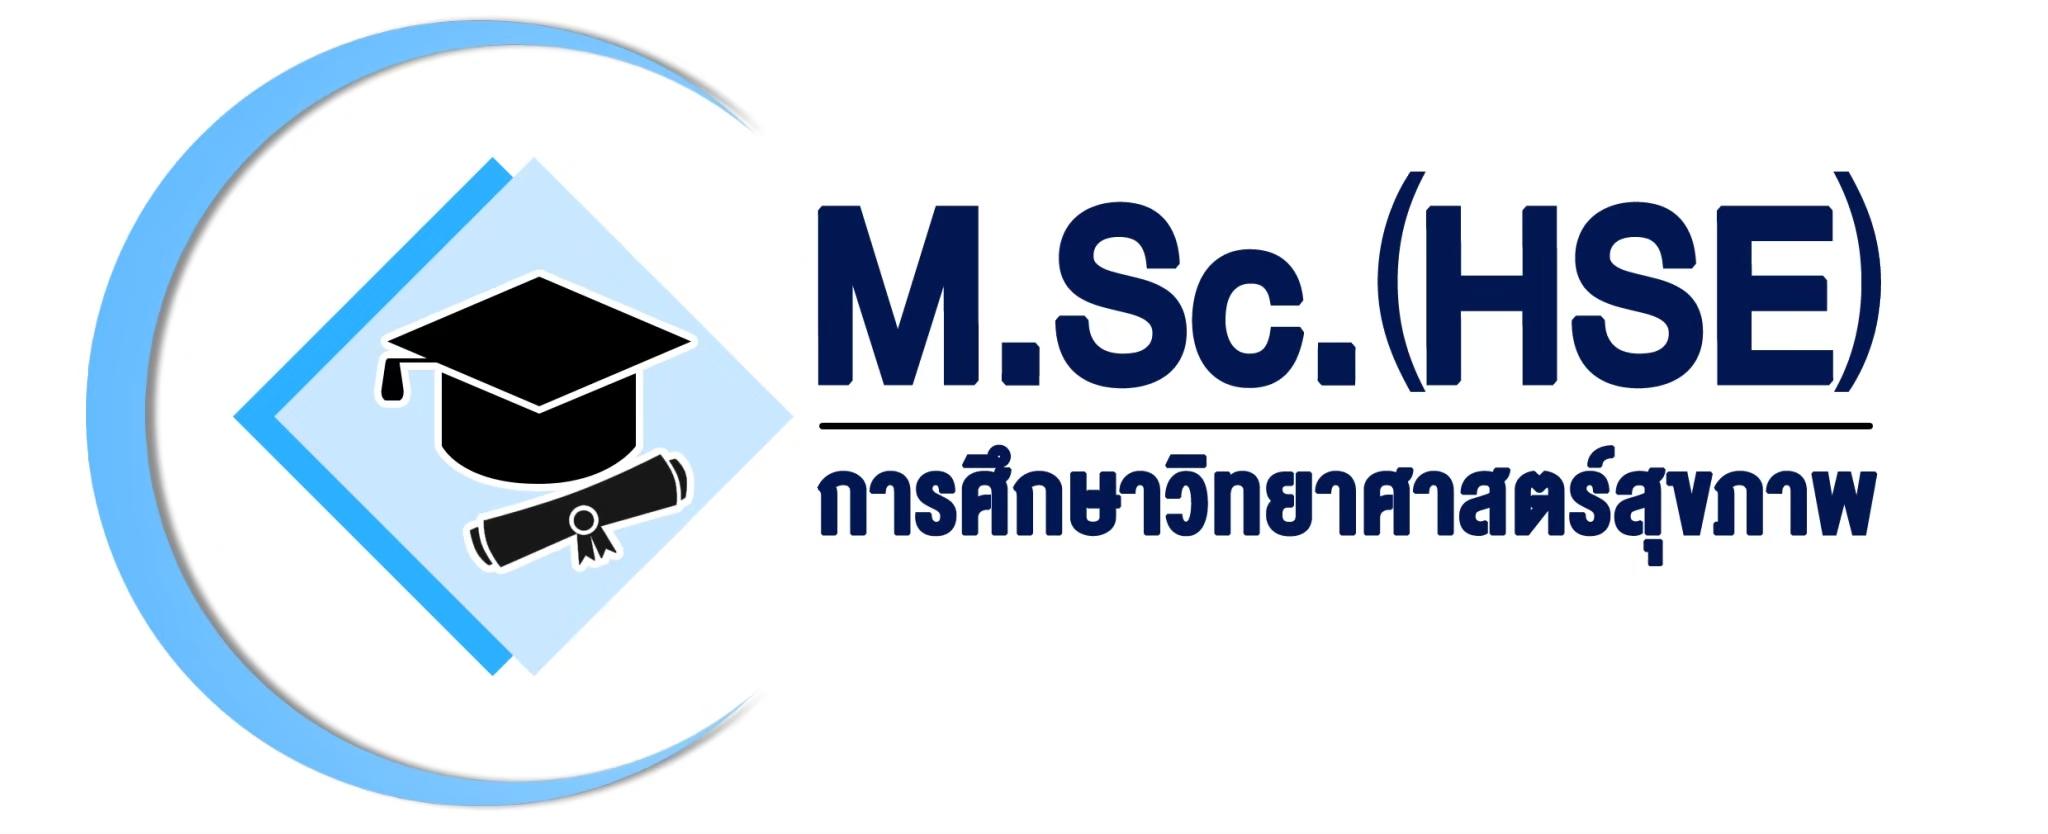 M.Sc HSE